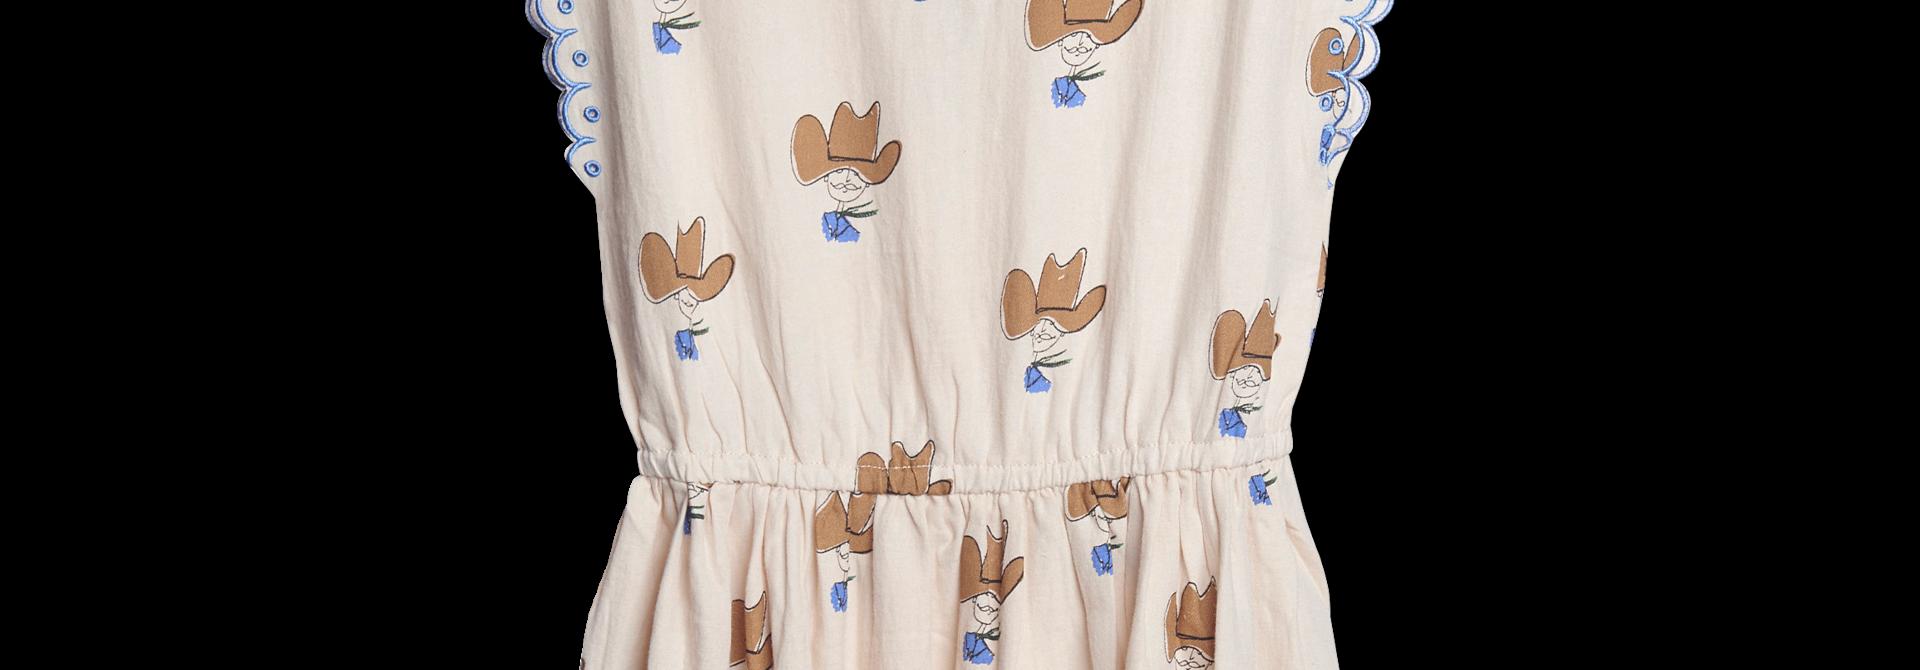 Montana Dress - cowboy